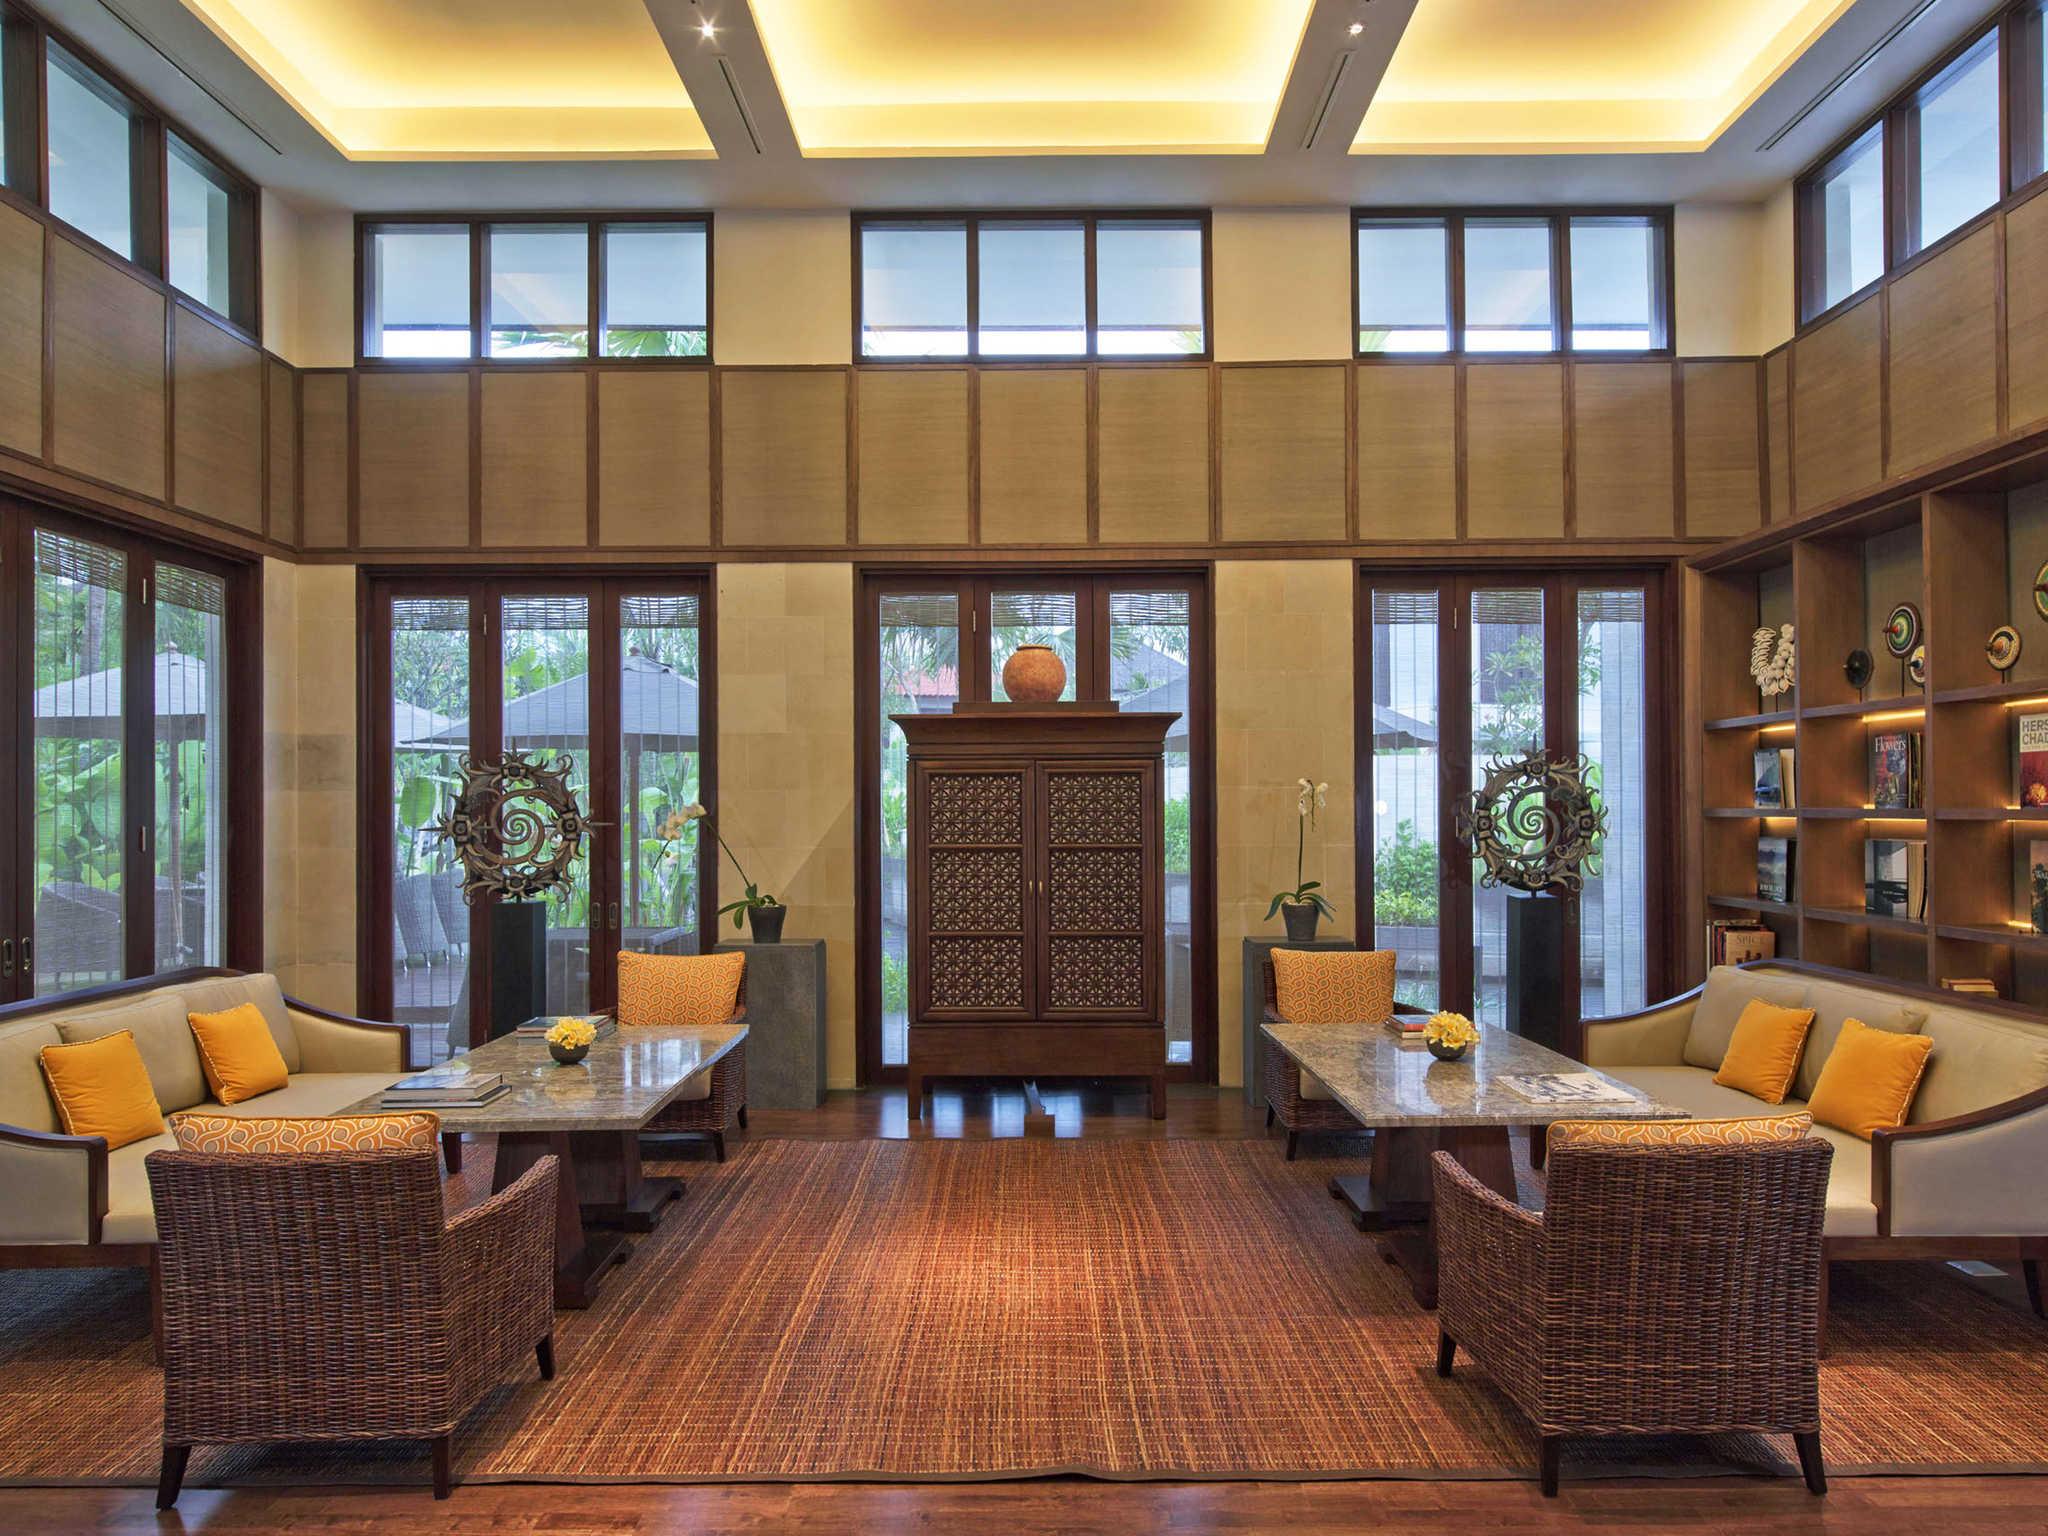 Hotel in BALI - Fairmont Sanur Beach Bali